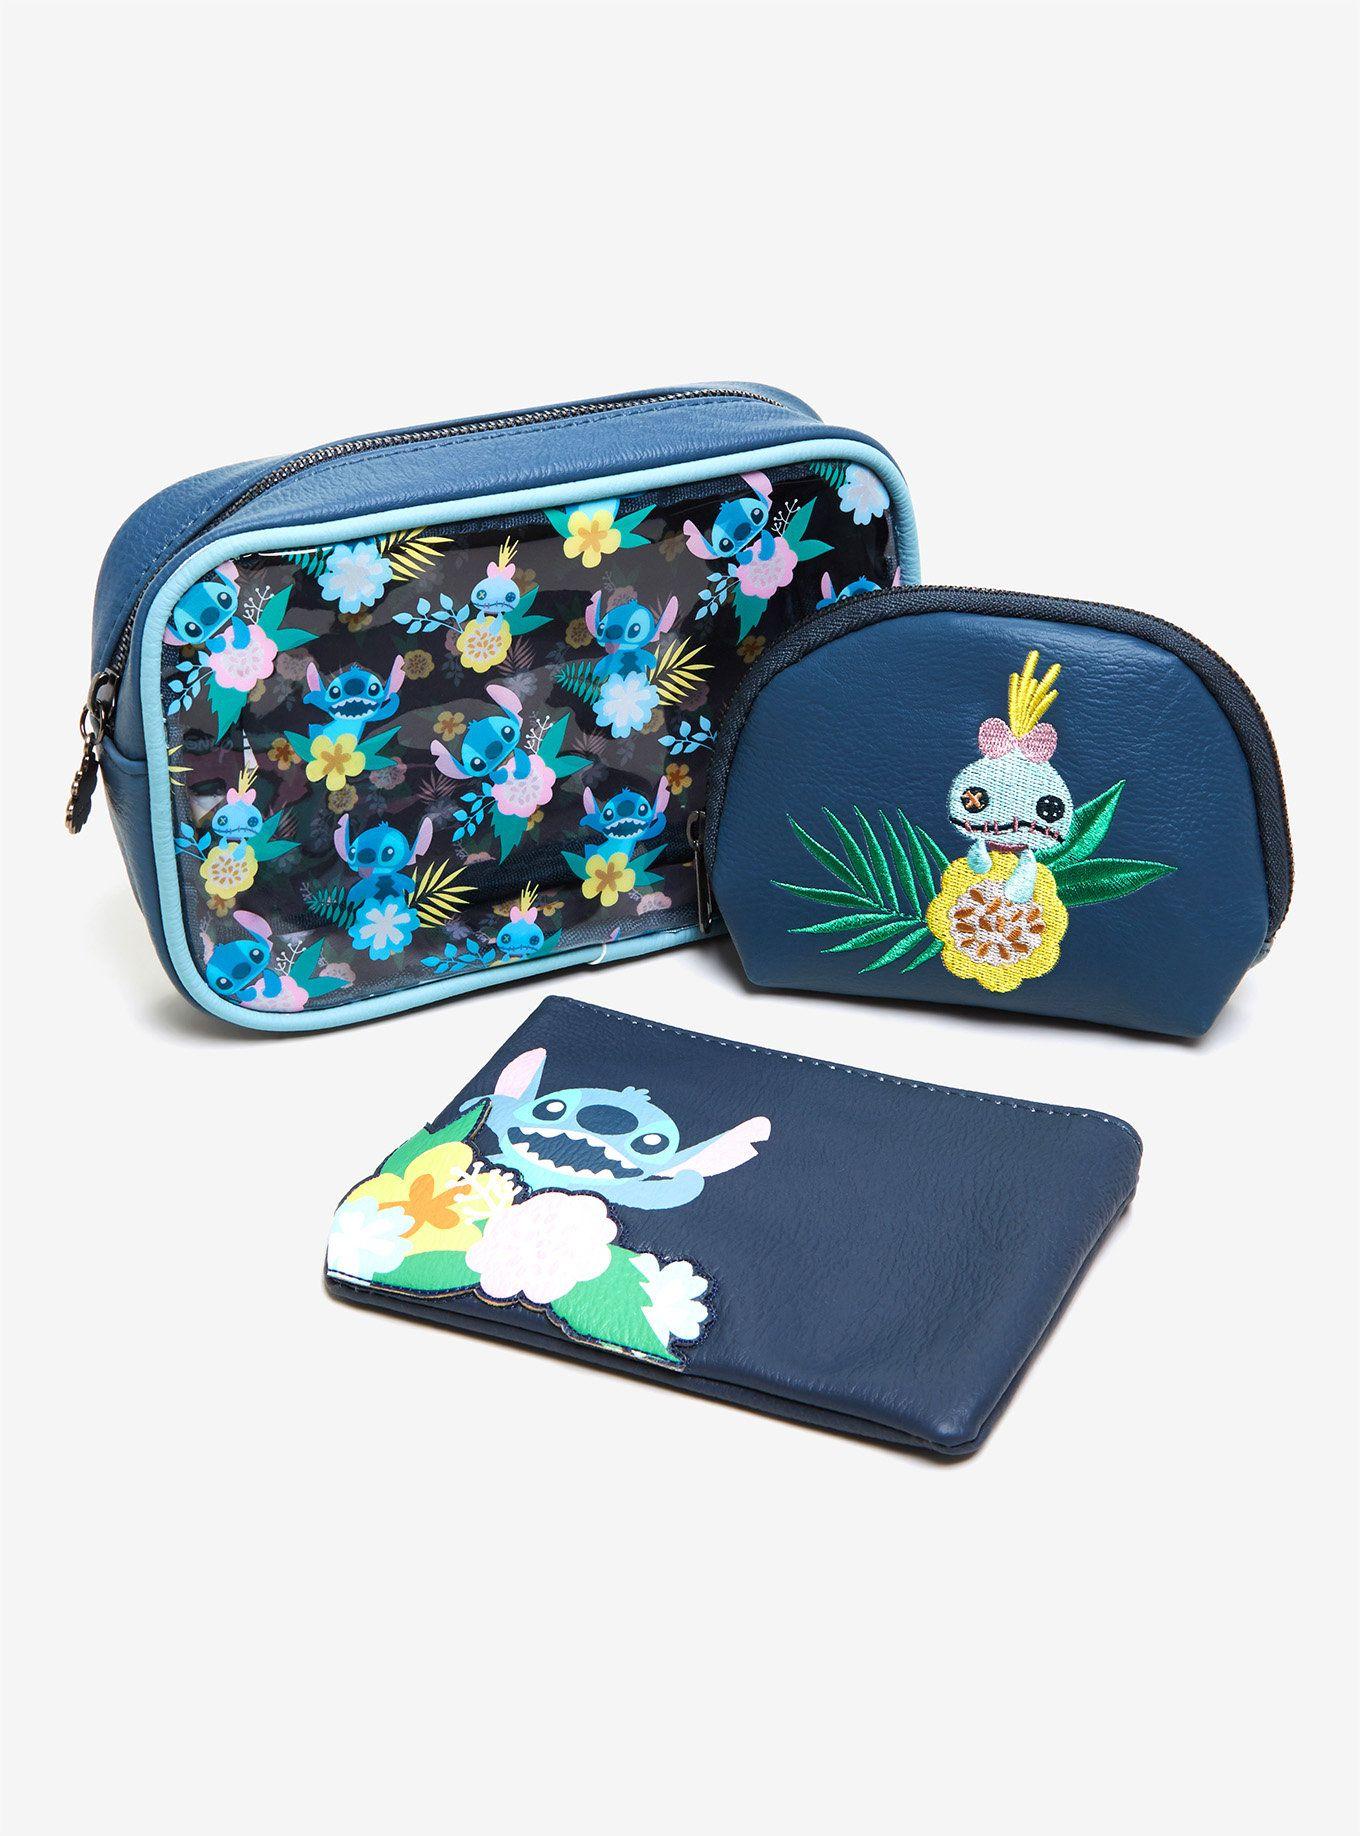 Loungefly Disney Lilo & Stitch Floral Makeup Bag Set